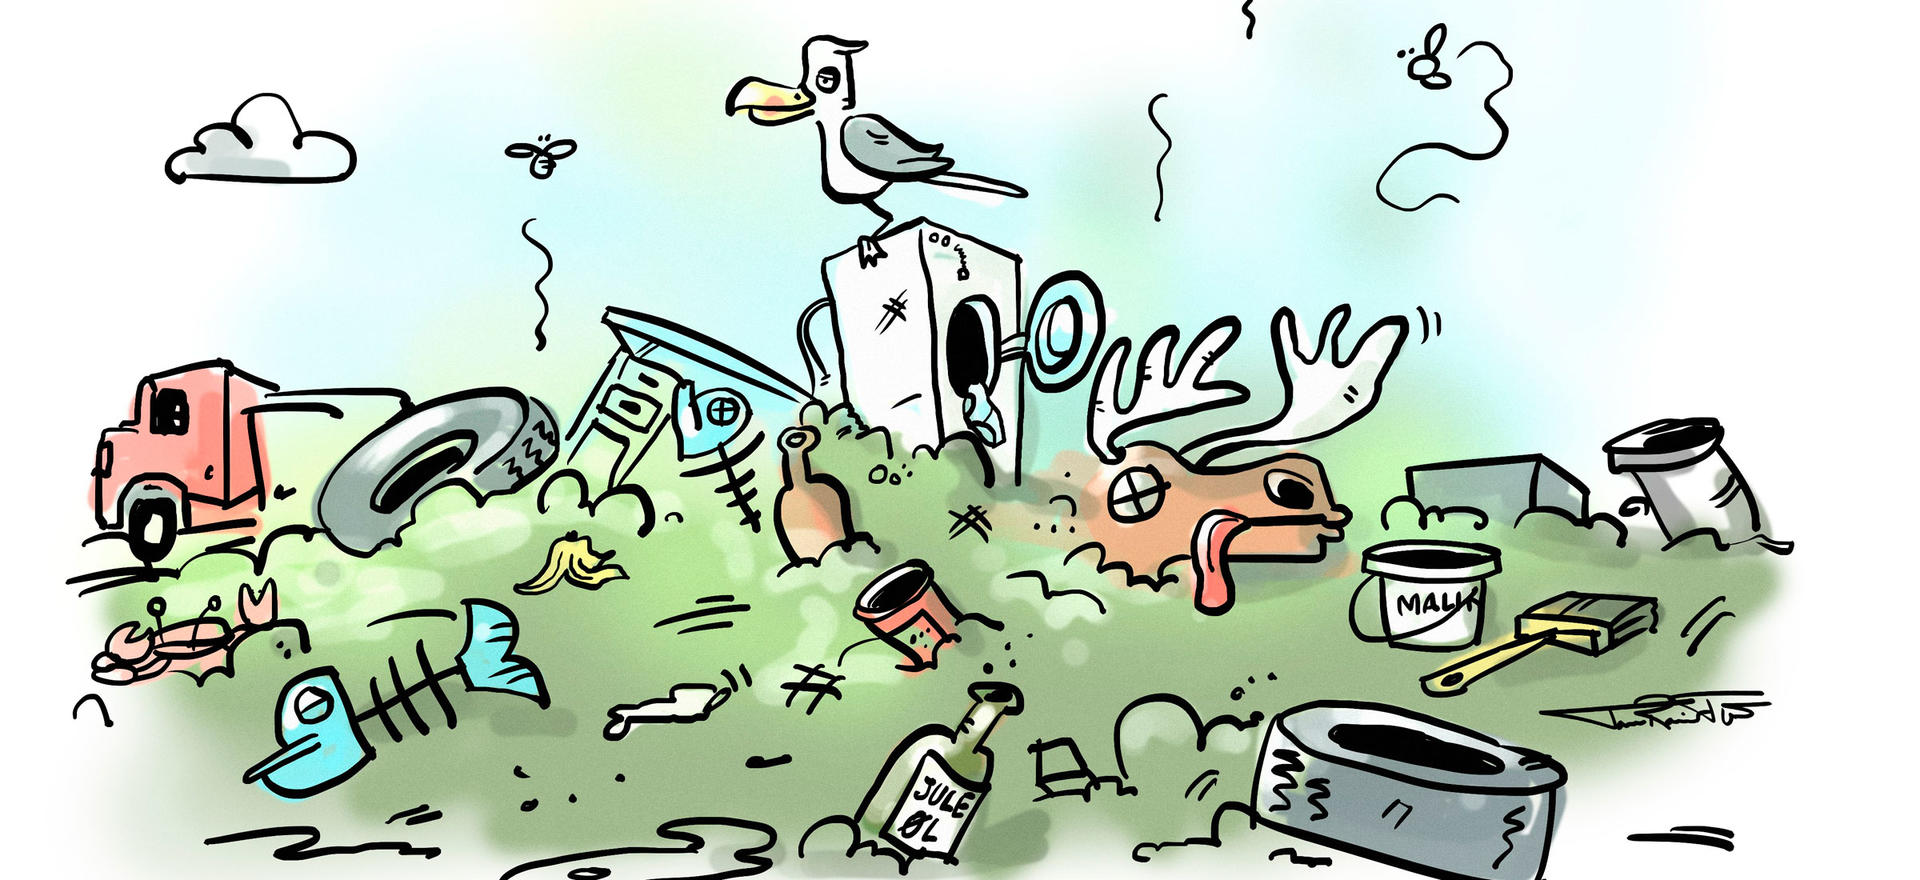 Gammel søppelfylling